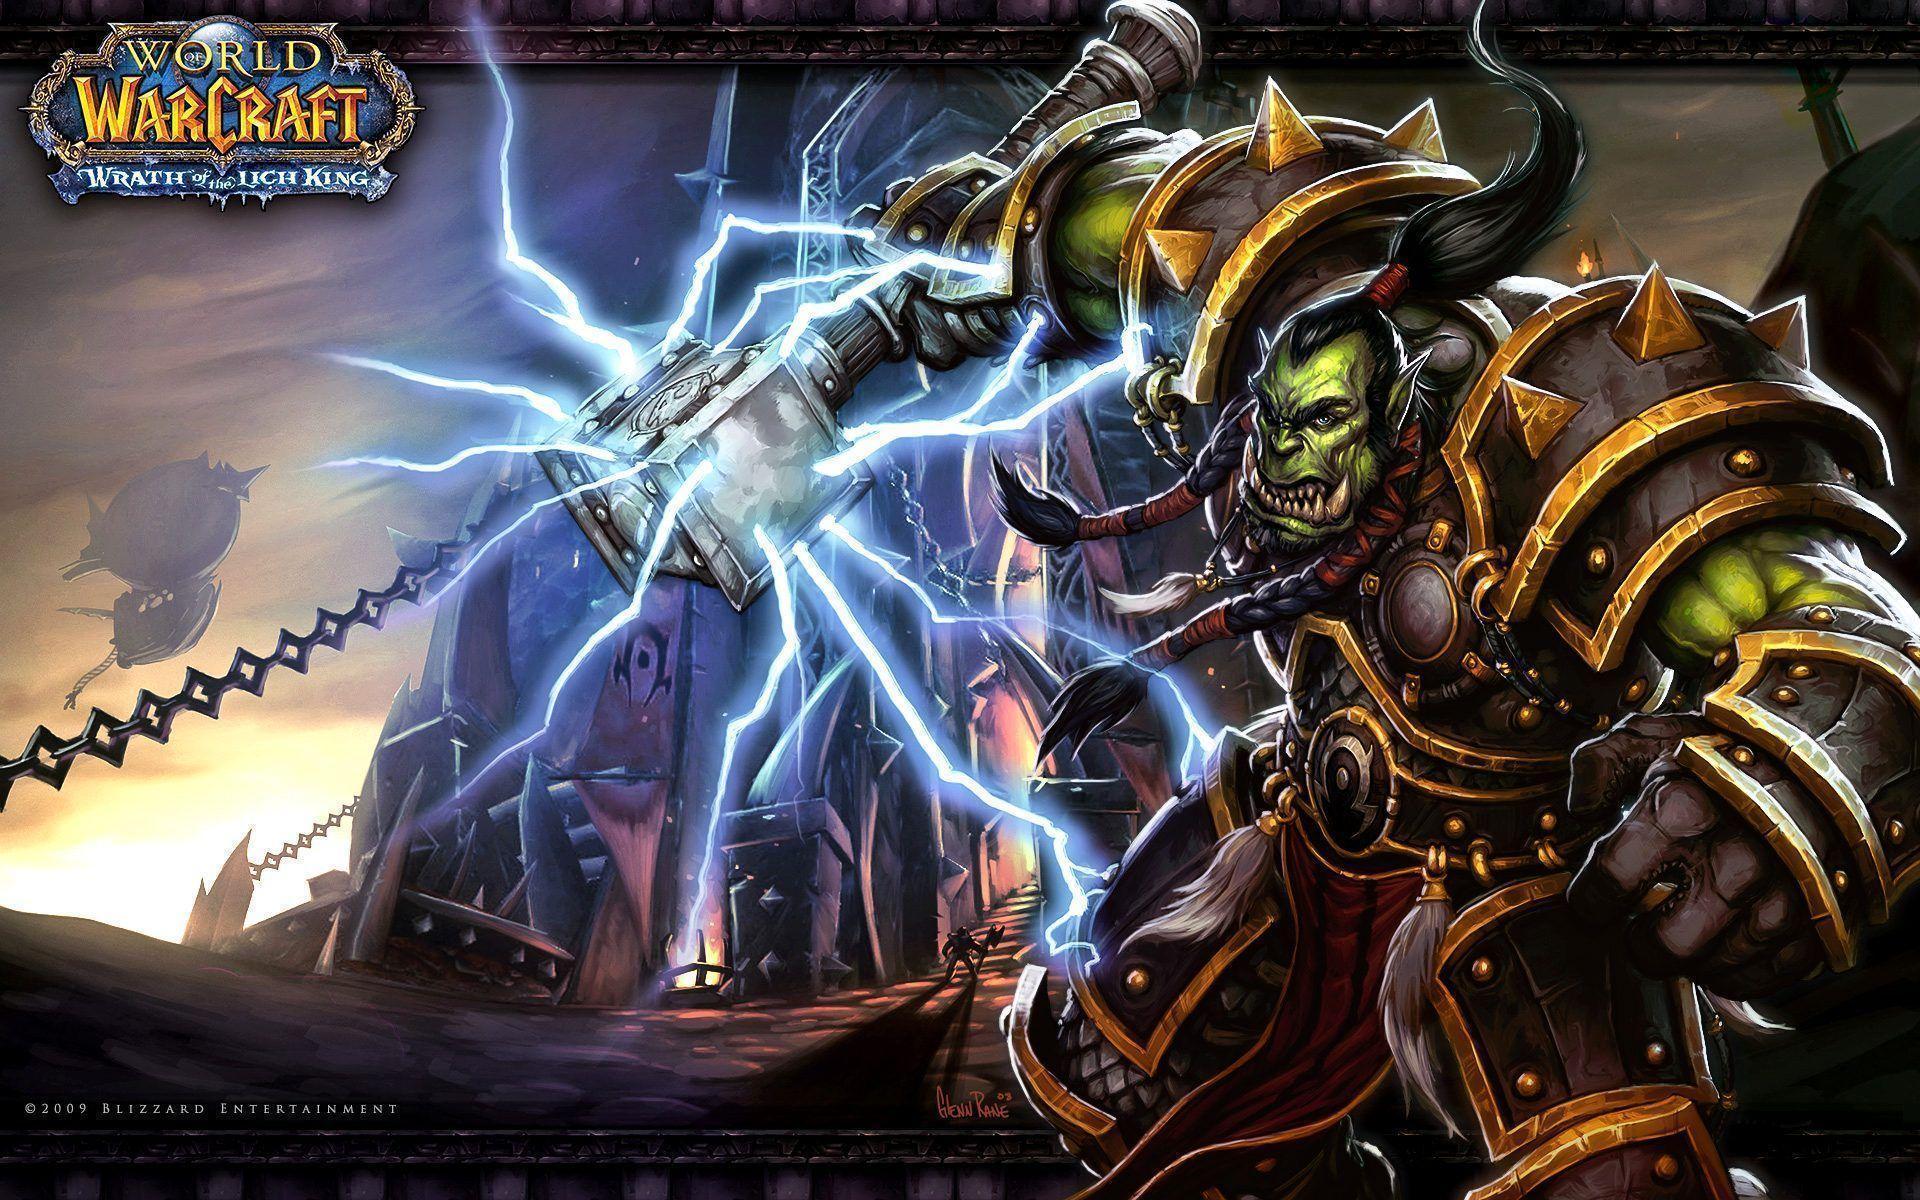 World Of Warcraft Images Hode Signs Wallpaper